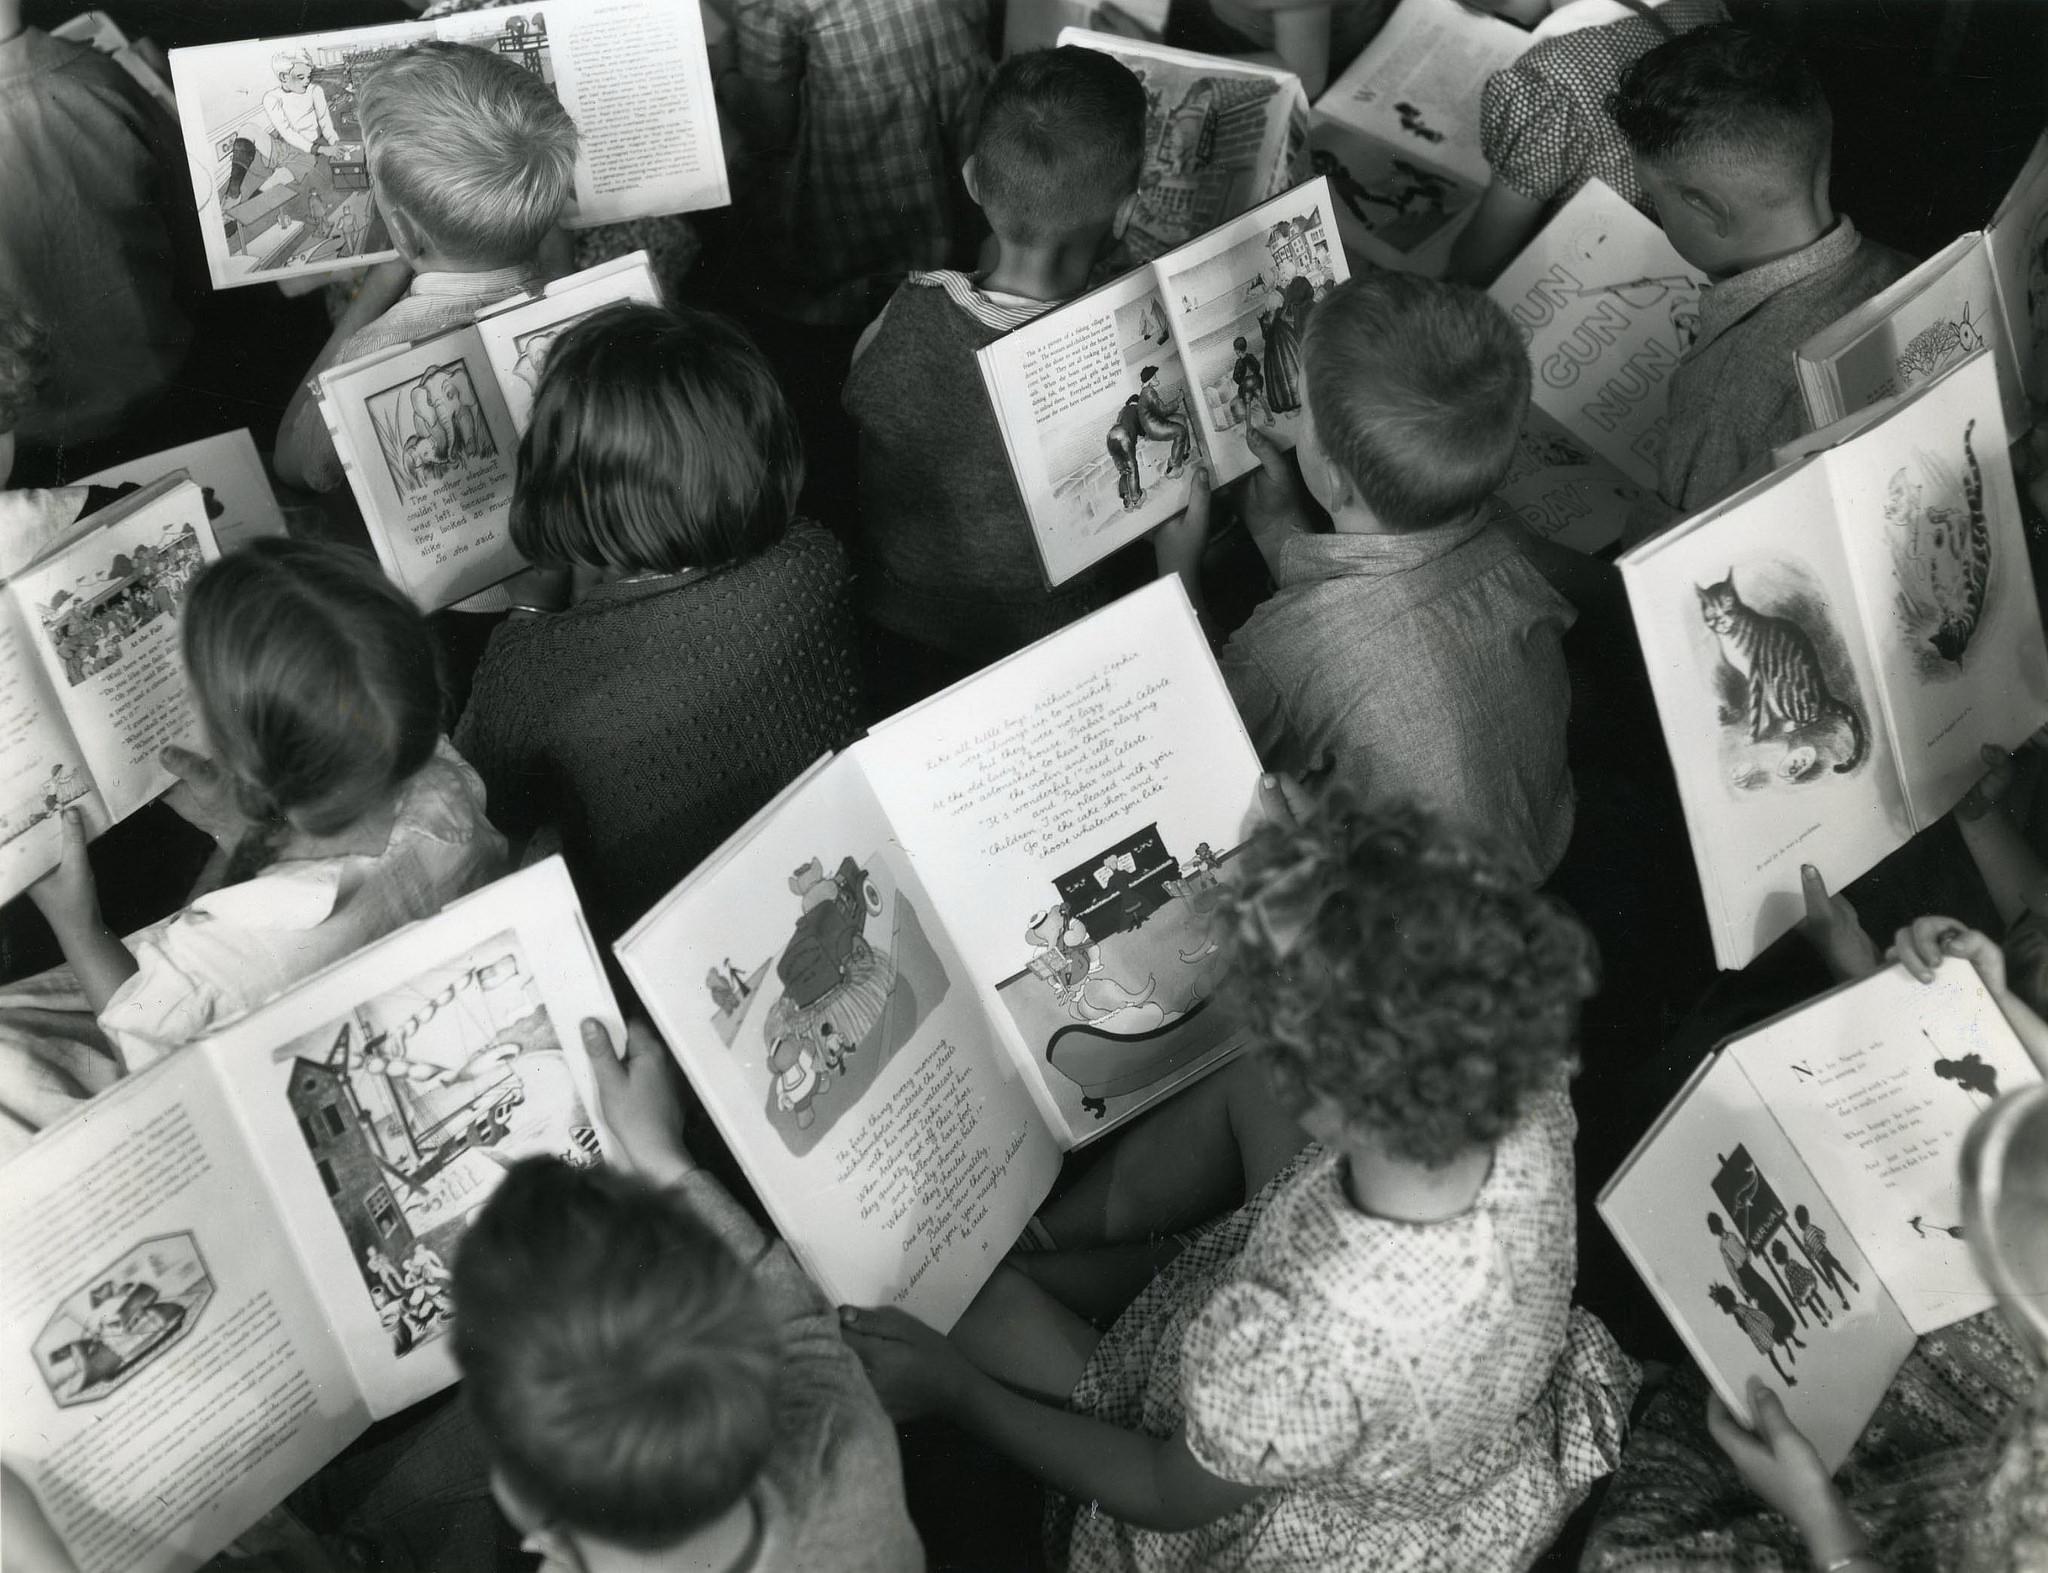 Djeca čitaju. Foto: Arhiv Novog Zelanda. Izvor: https://www.flickr.com/photos/archivesnz/